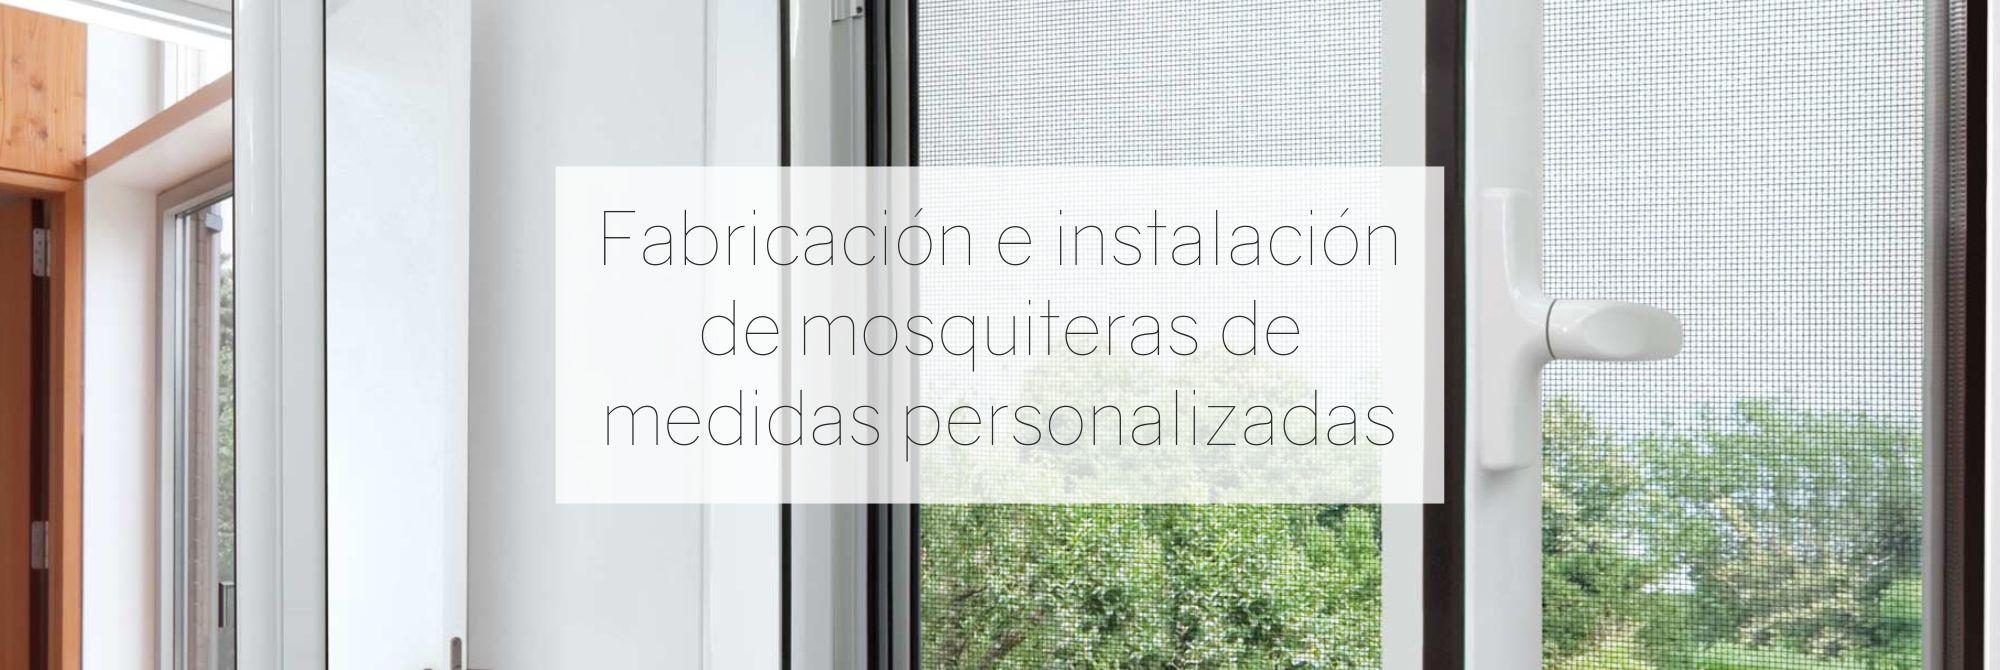 mosquiteras personalizadas rótulos luminosos Art Design